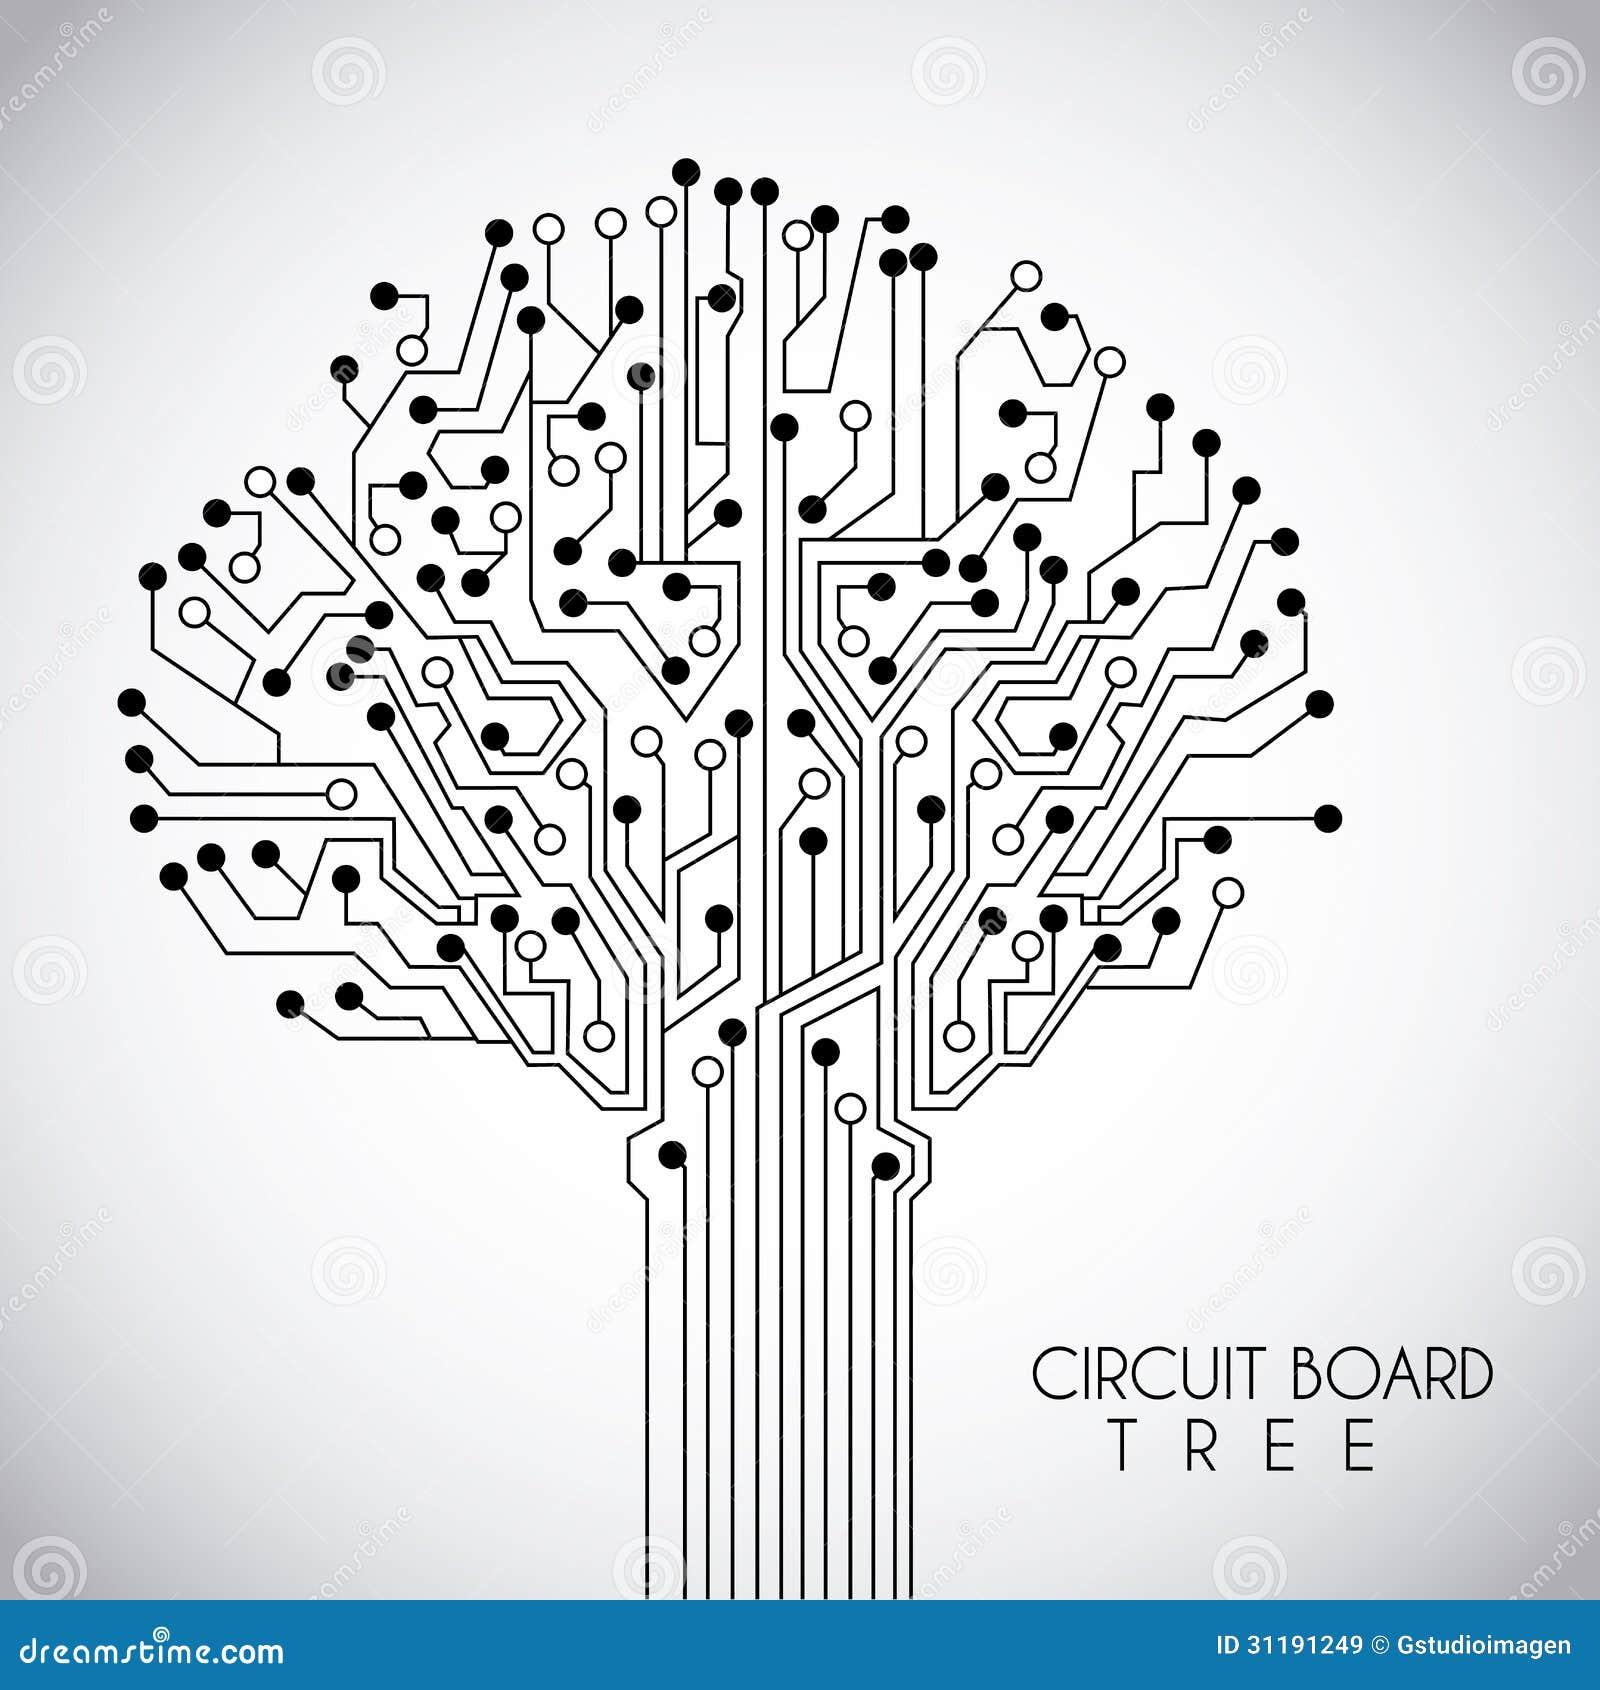 circuit design background - Tire.driveeasy.co